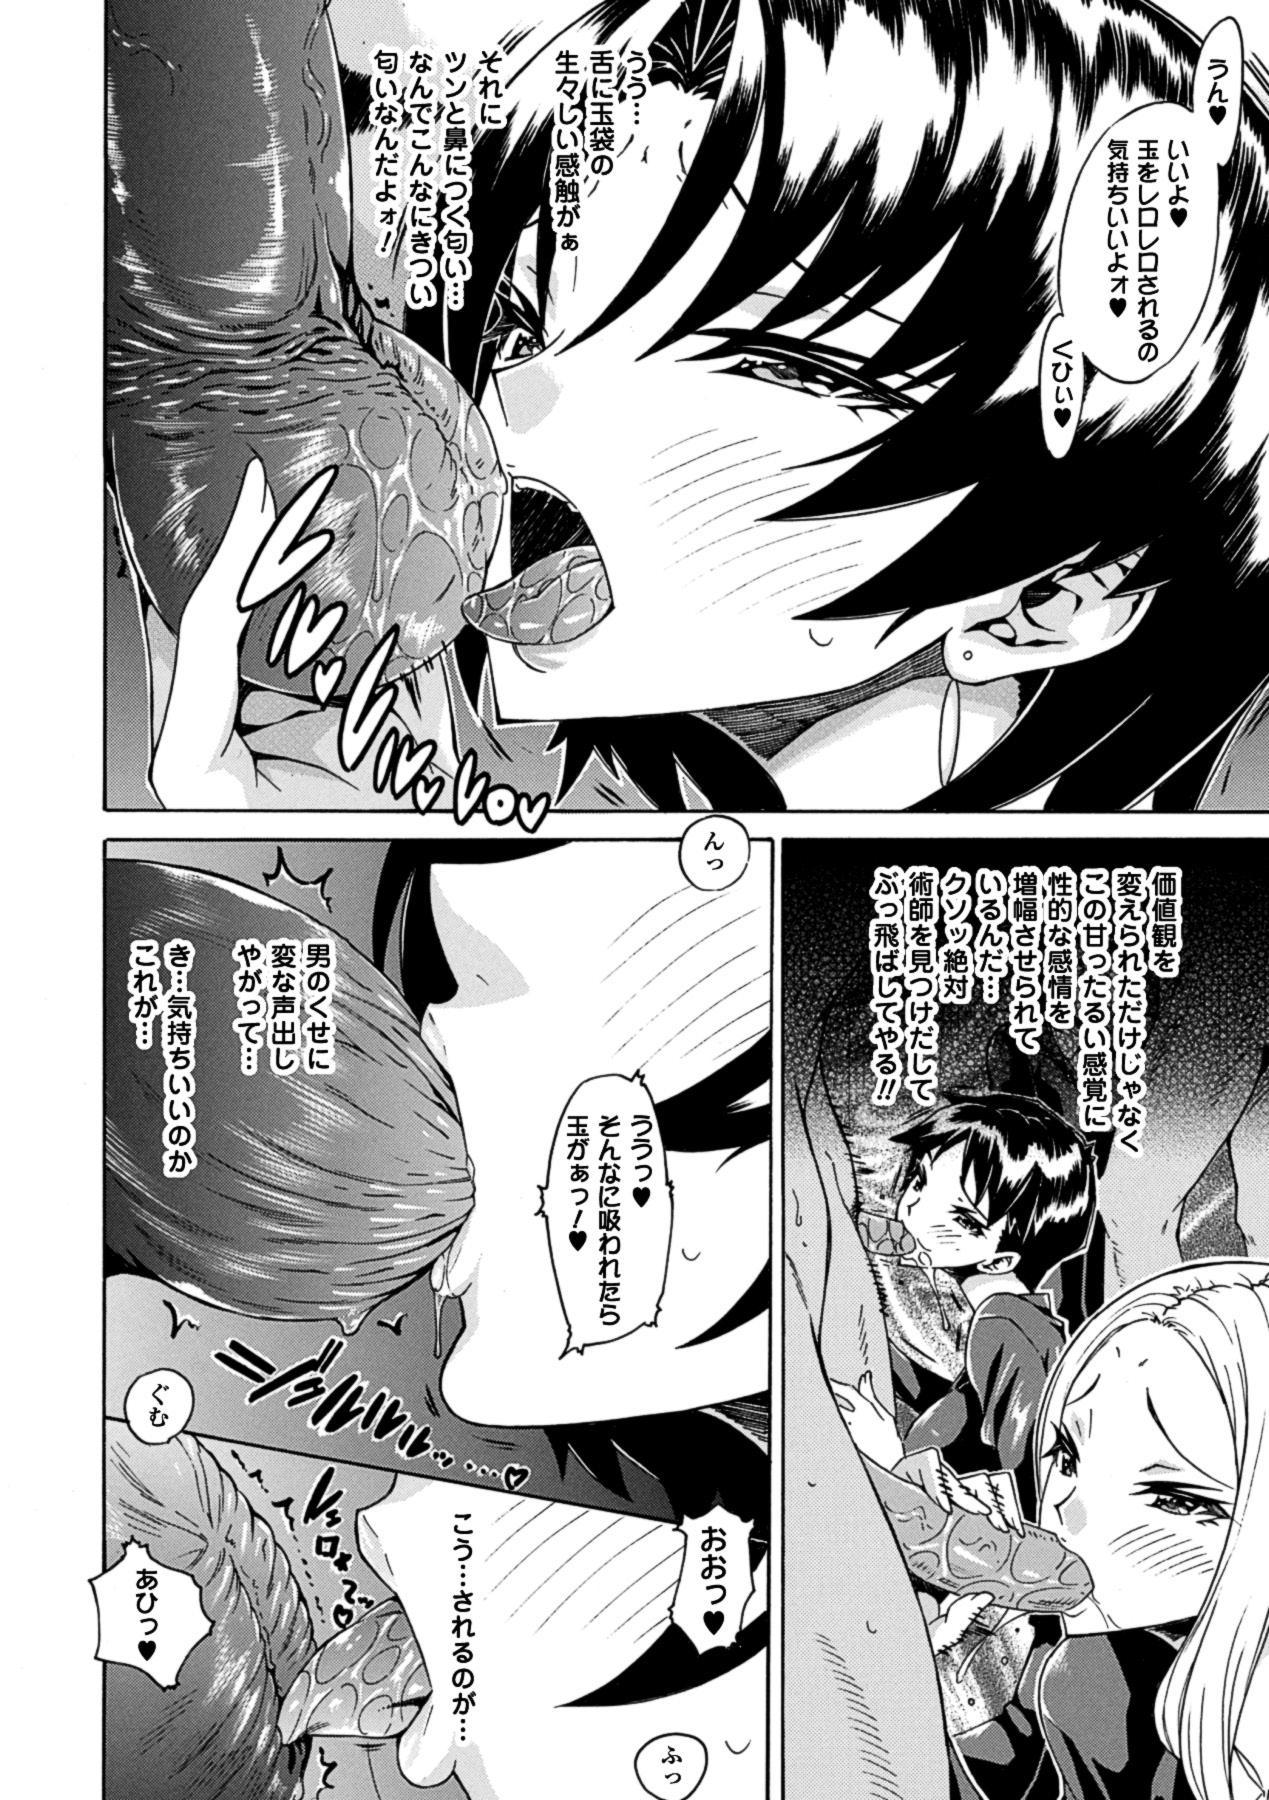 Megami Crisis 10 159